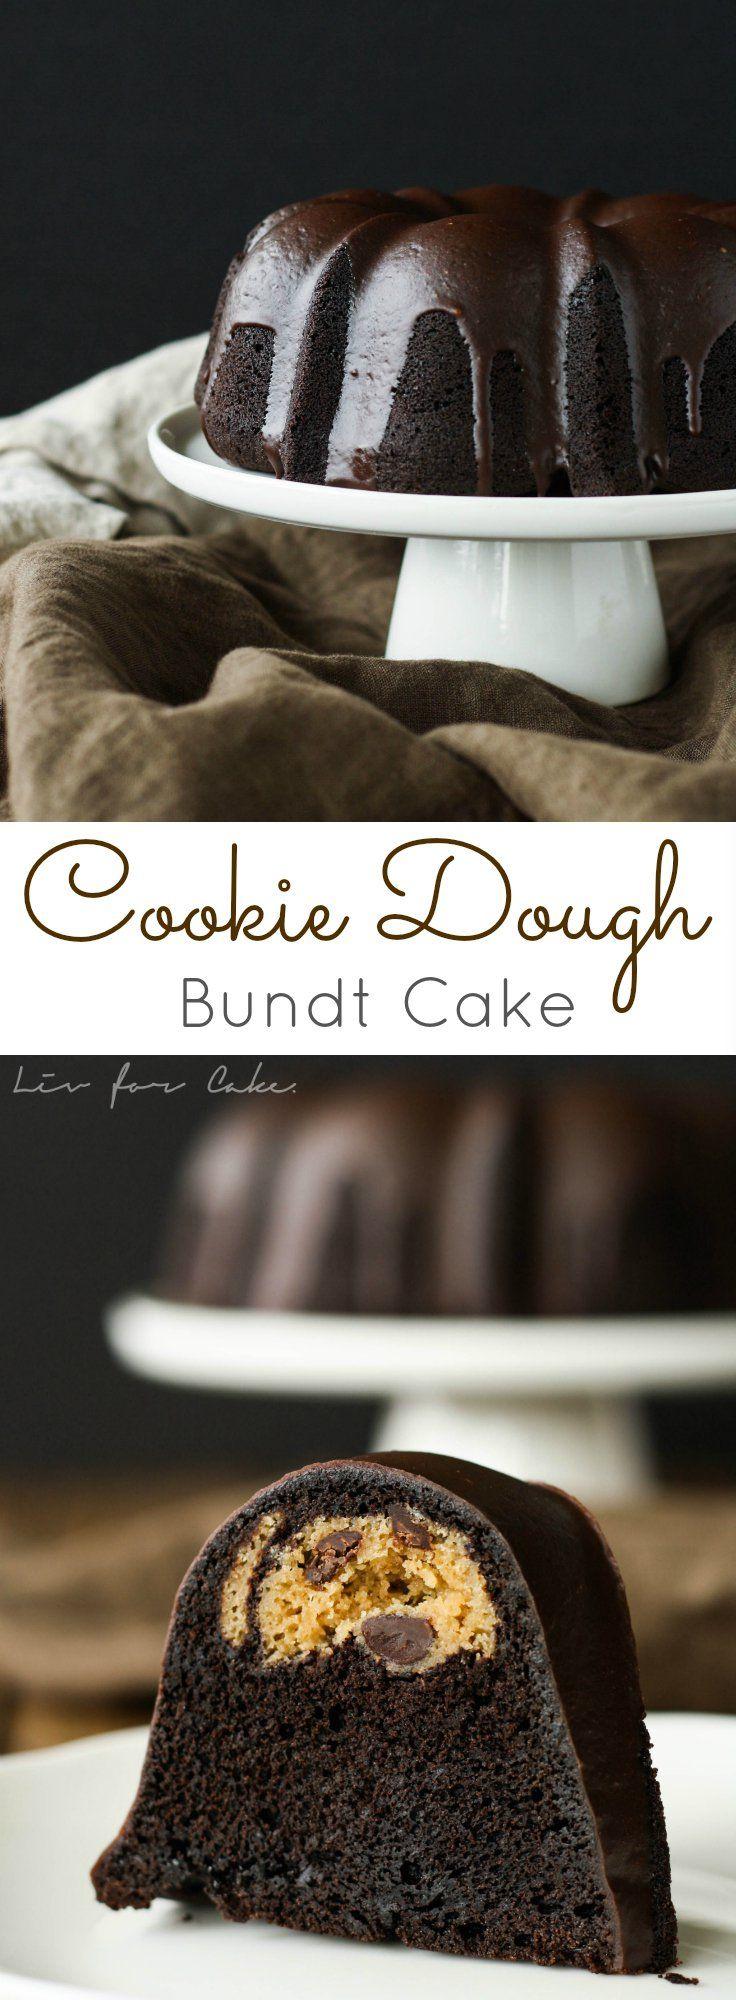 This black cocoa chocolate bundt has a chocolate chip cookie dough surprise inside. #BundtBakers | livforcake.com